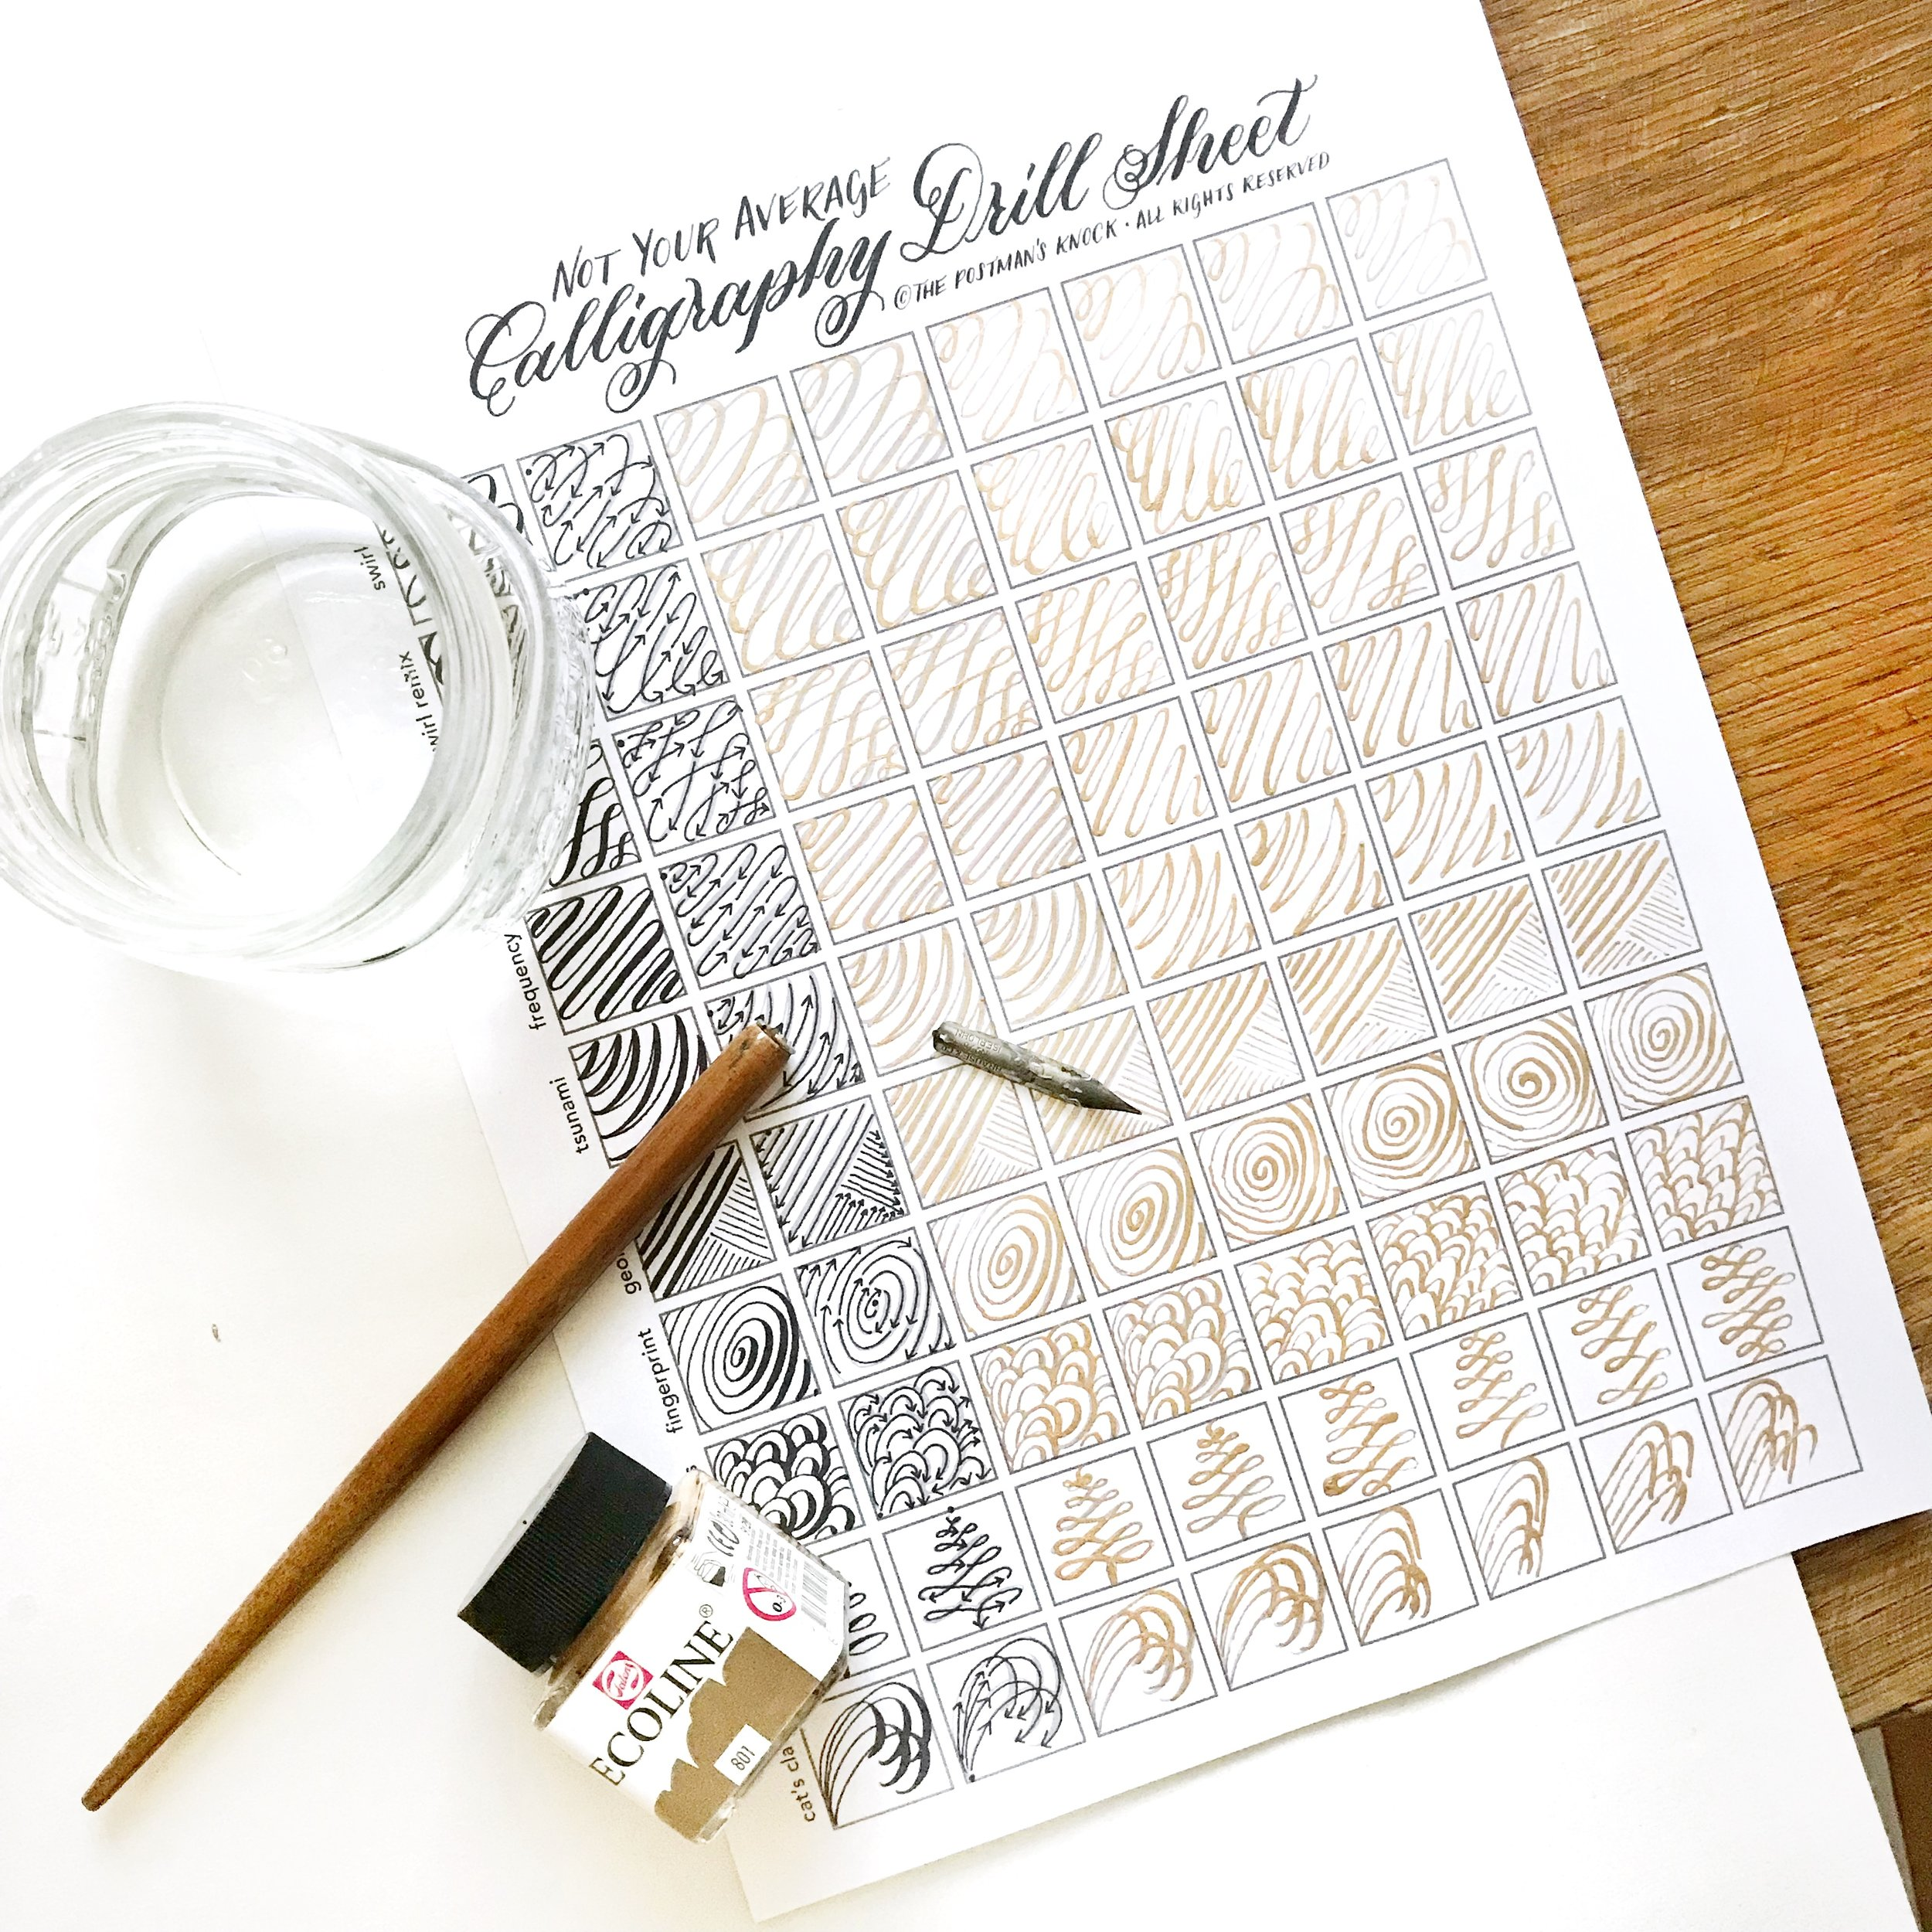 Calligraphy drills.jpg